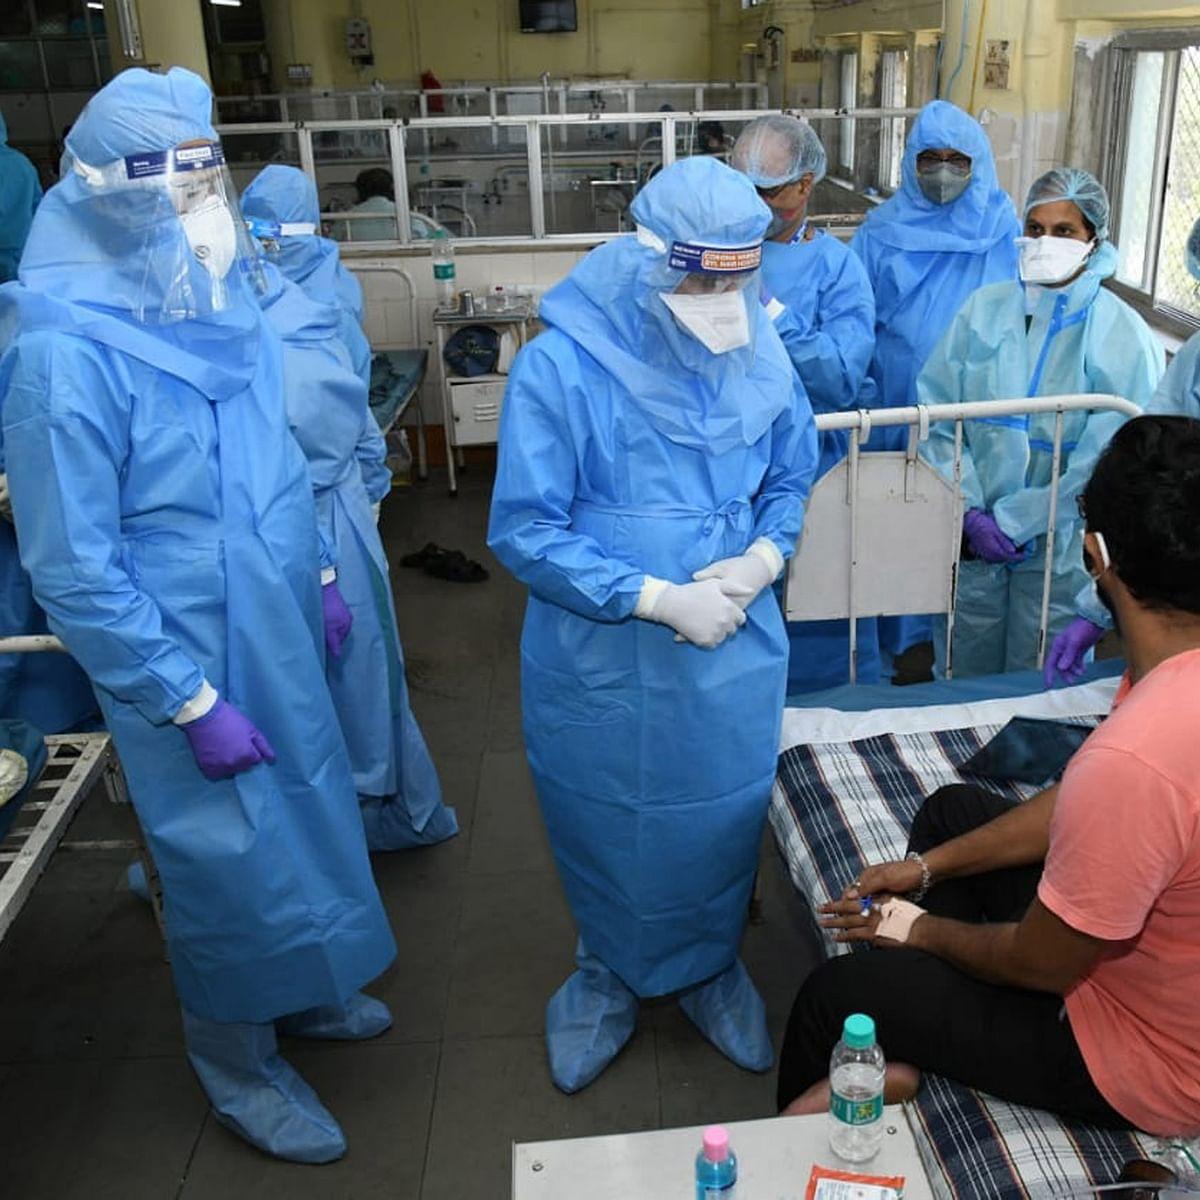 No shortage of beds in city hospitals: BMC amid coronavirus outbreak